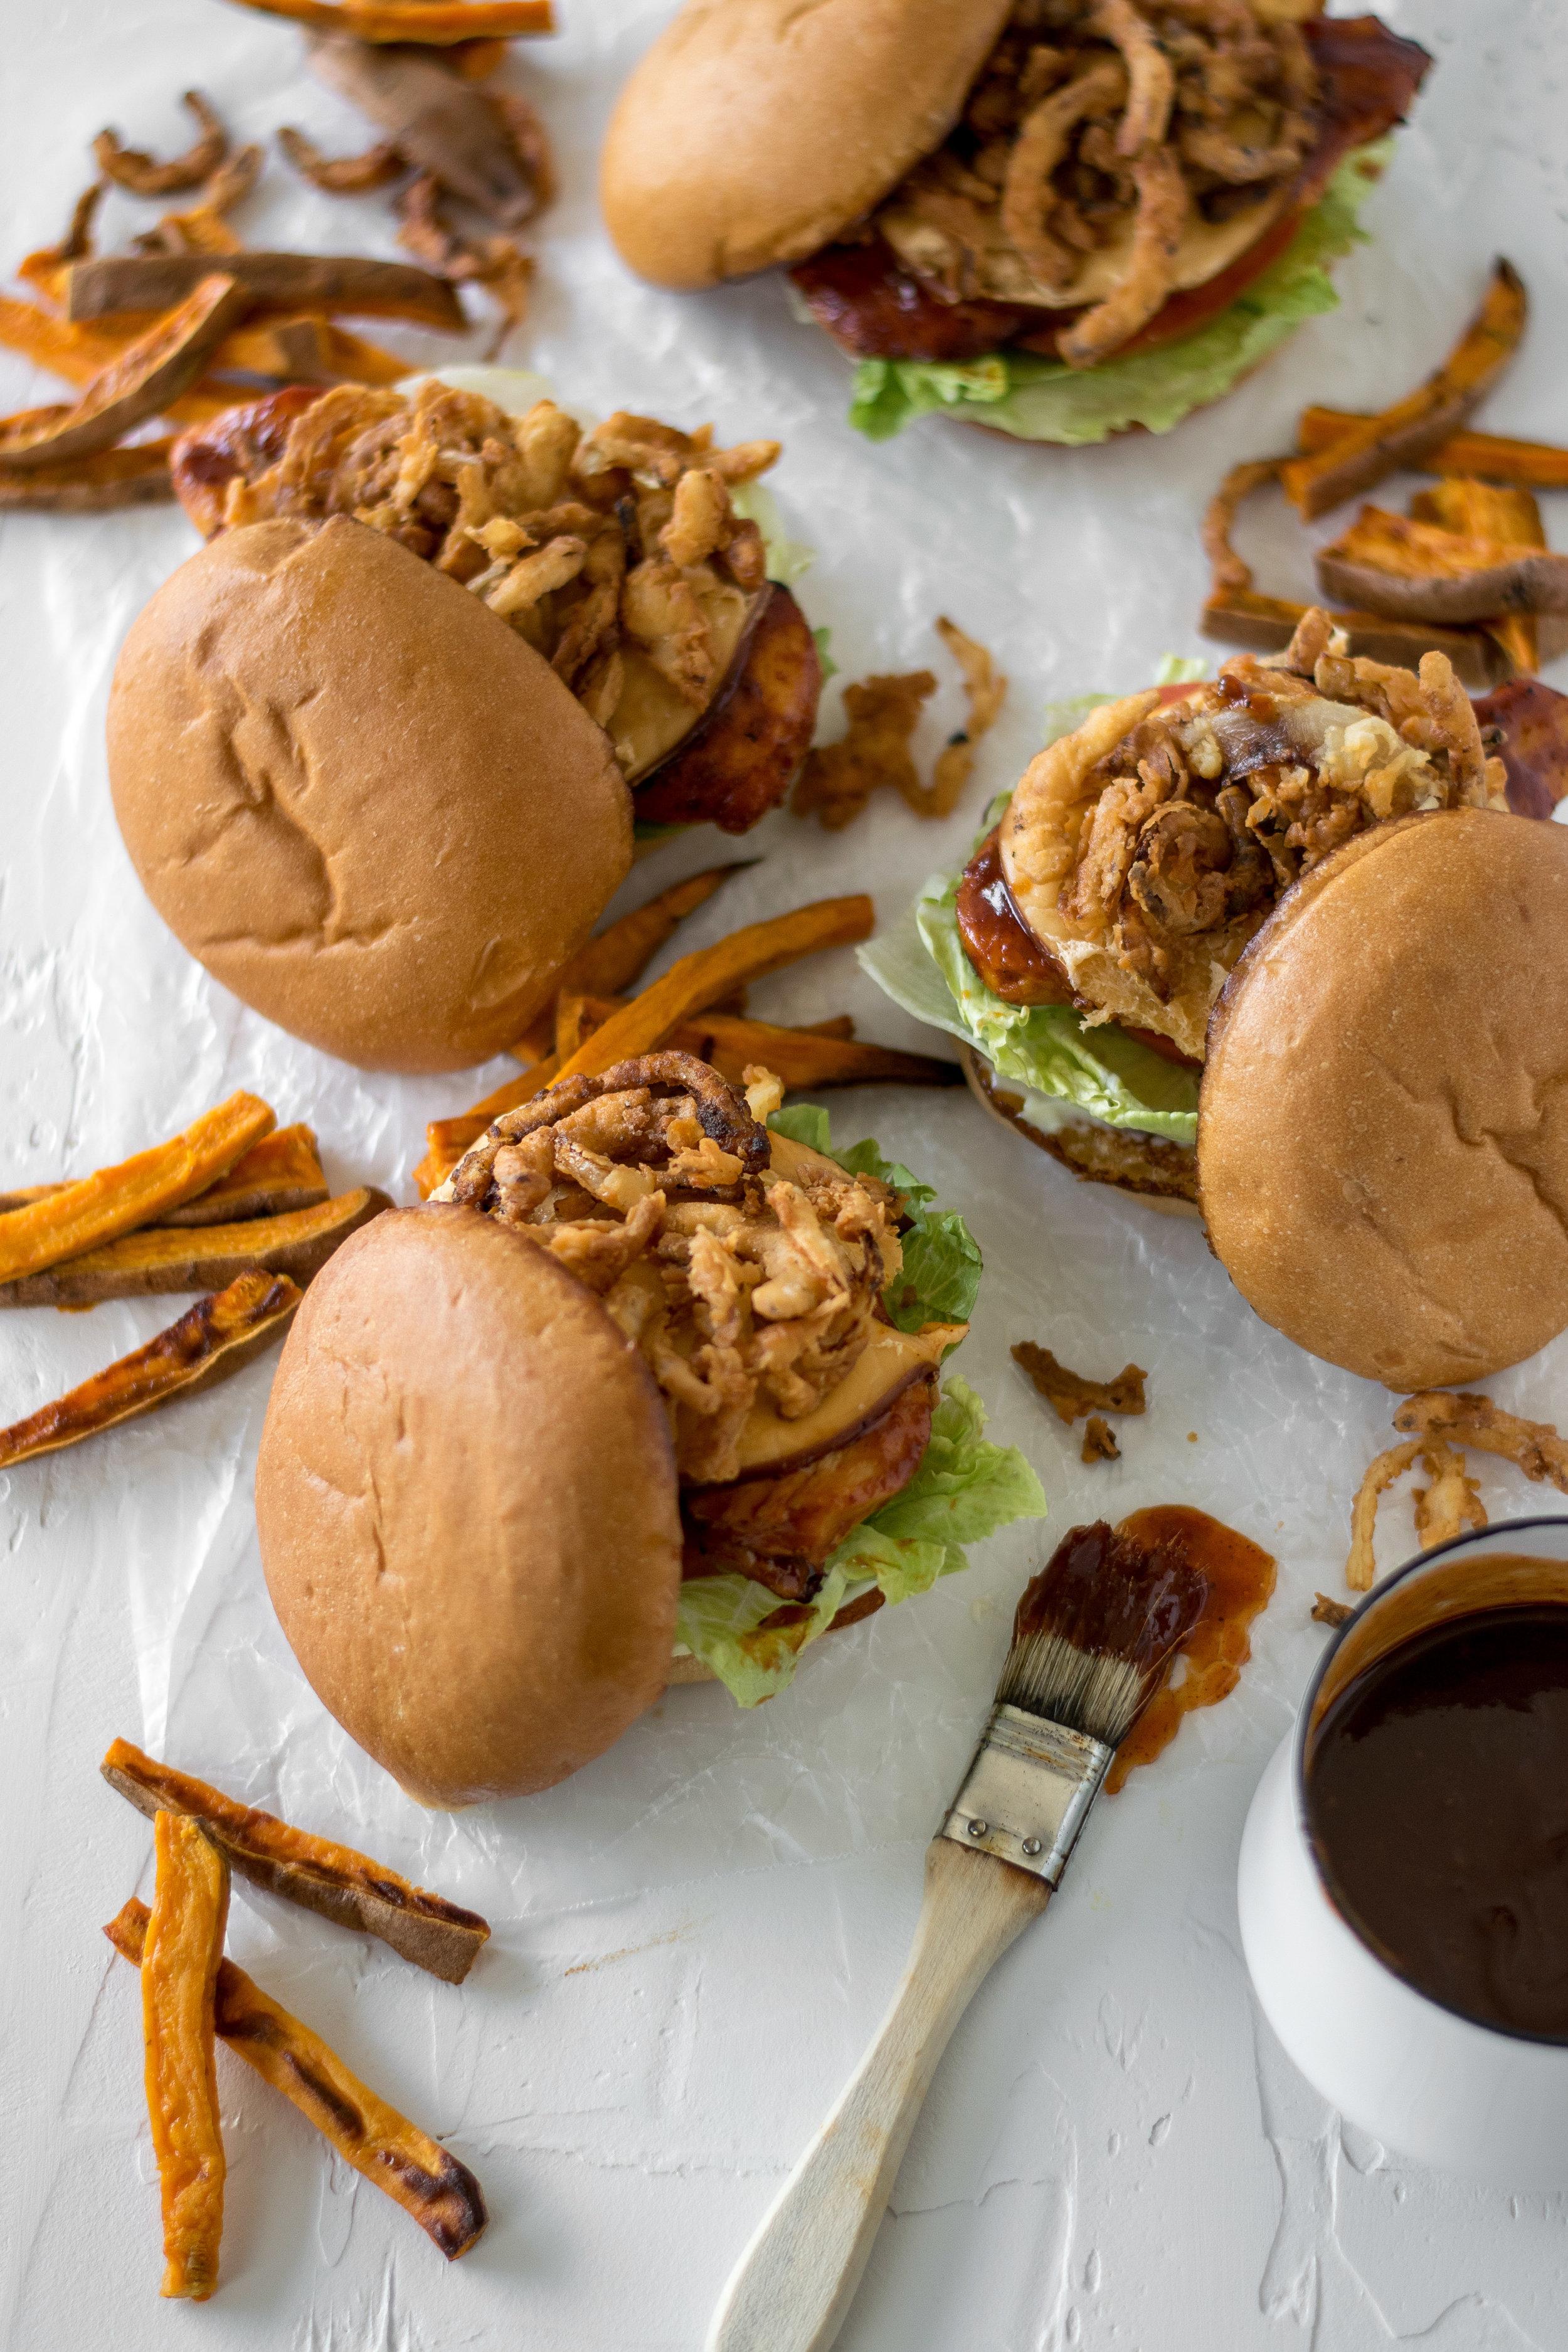 Bourbon Barbecue Chicken Burgers with Crispy Onion Straws | All Purpose Flour Child